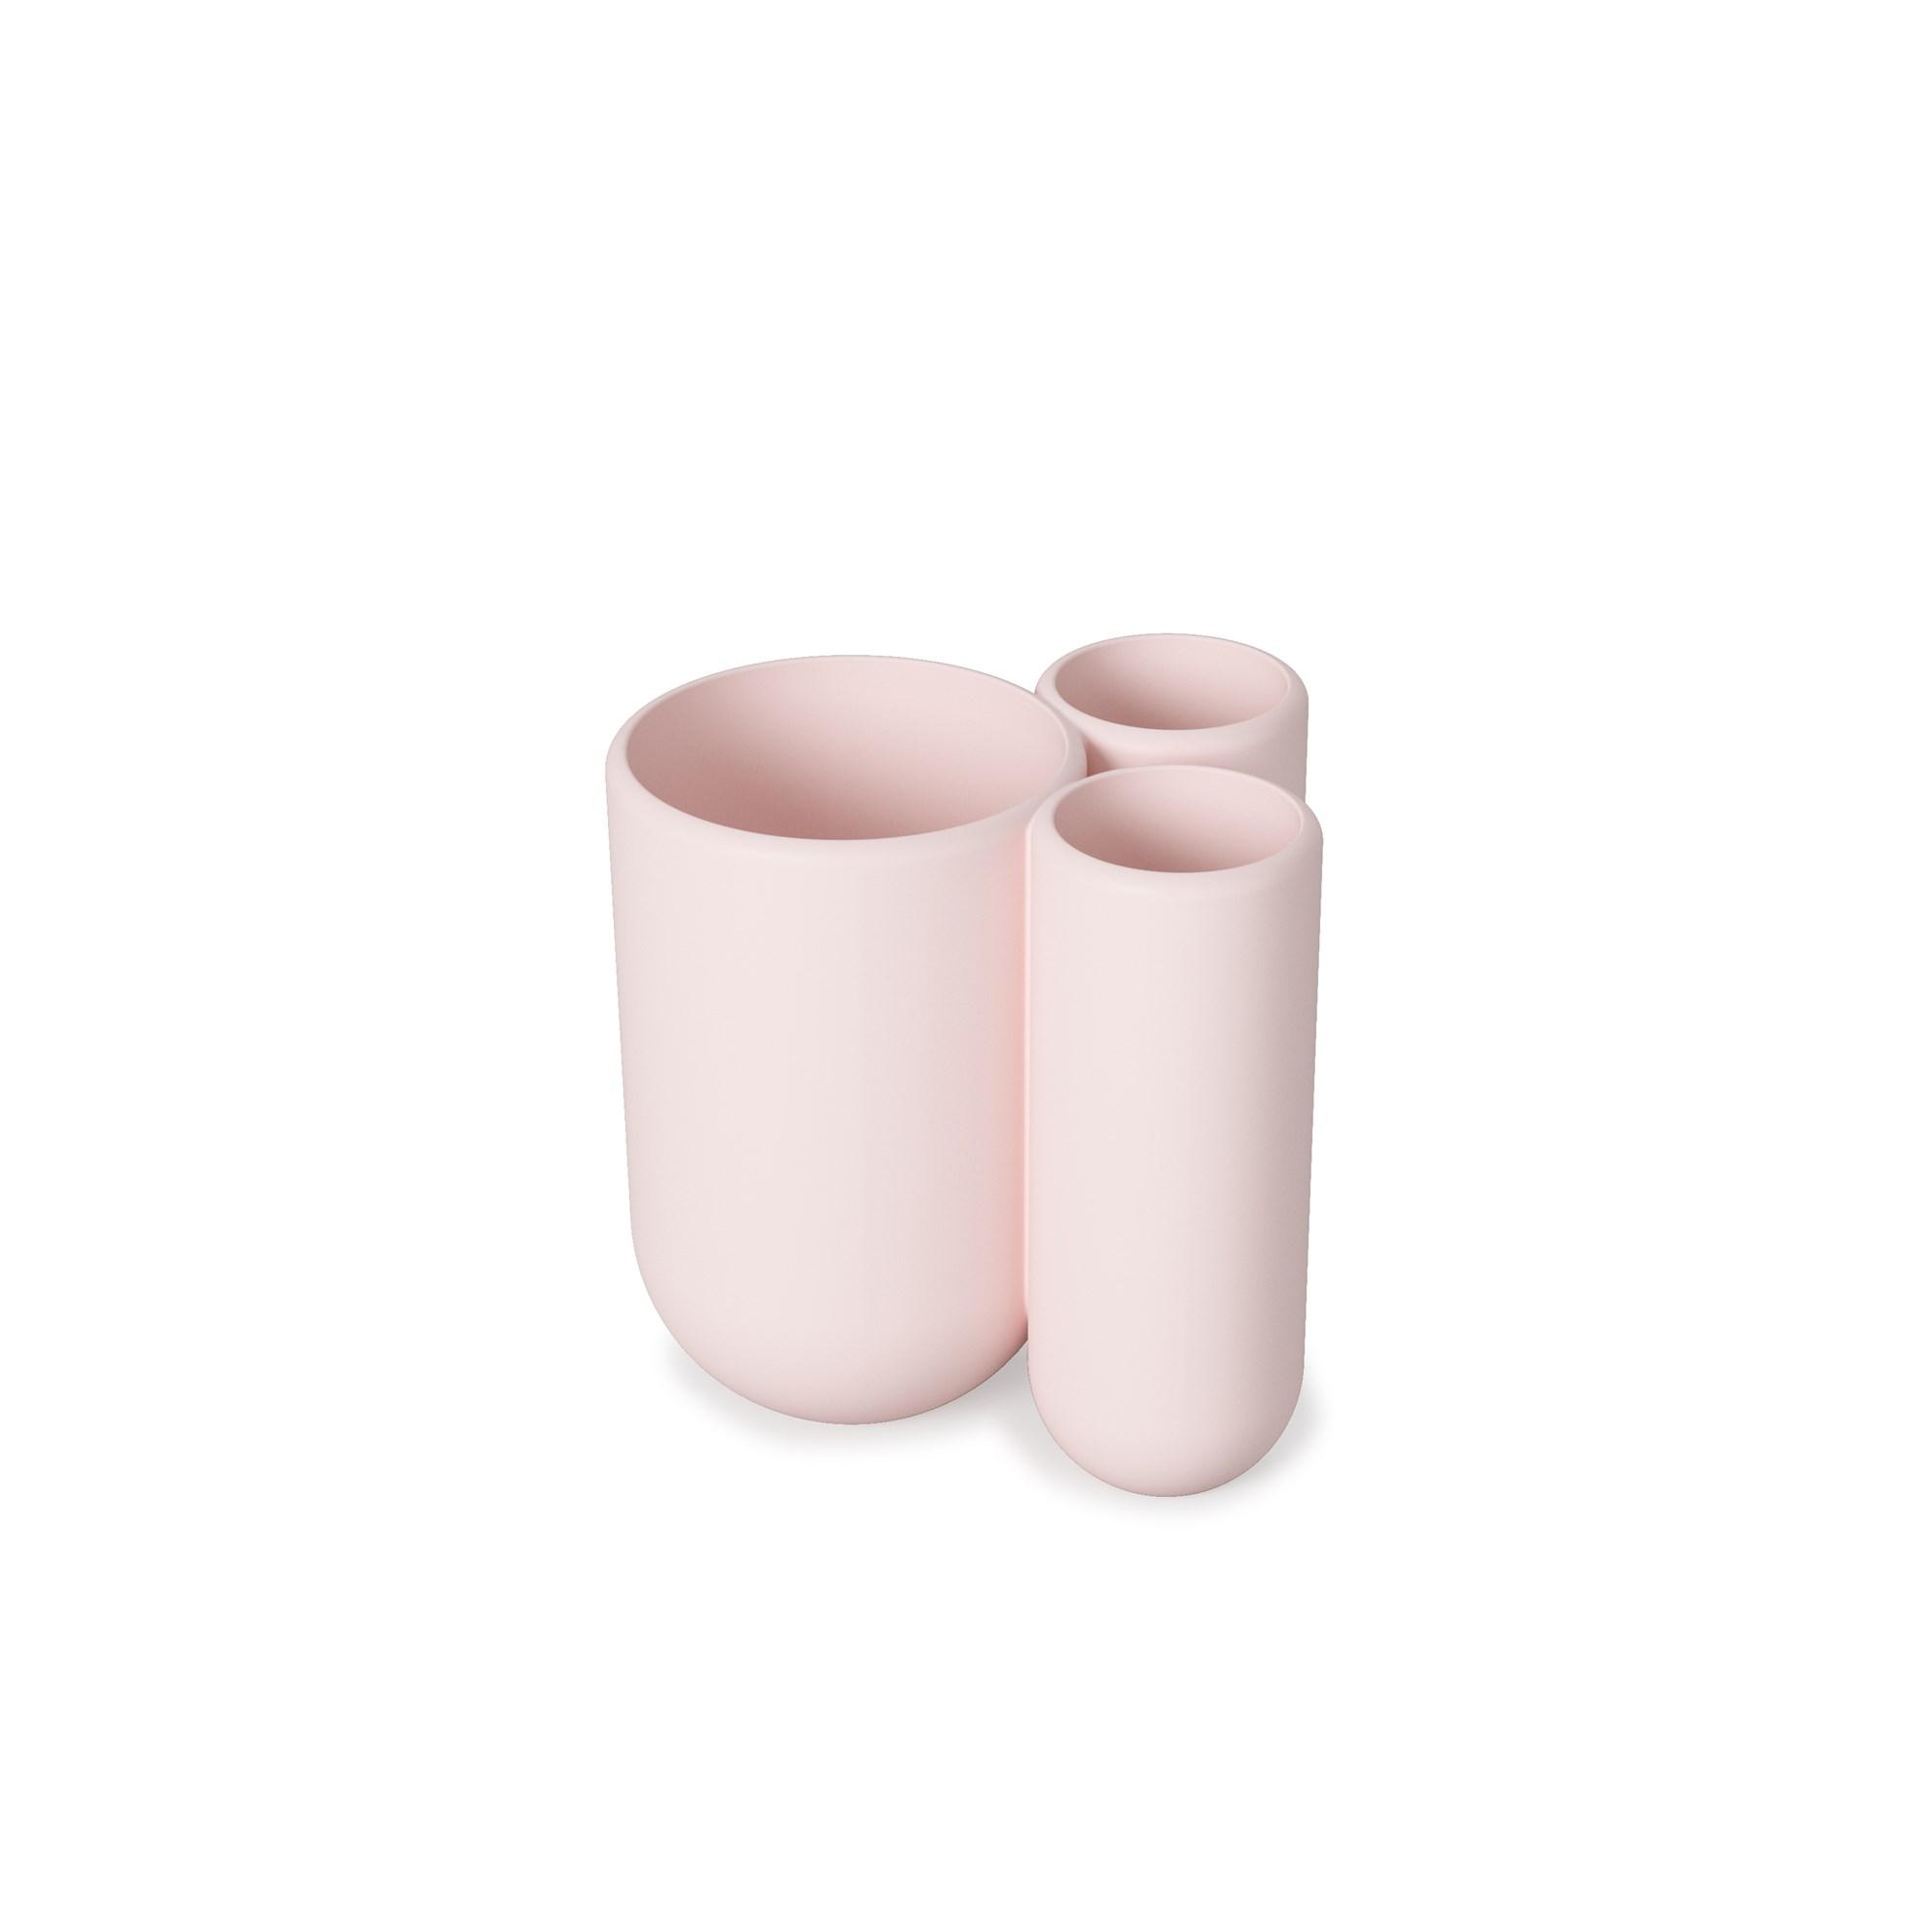 Kelímek na kartáček TOUCH růžový_1